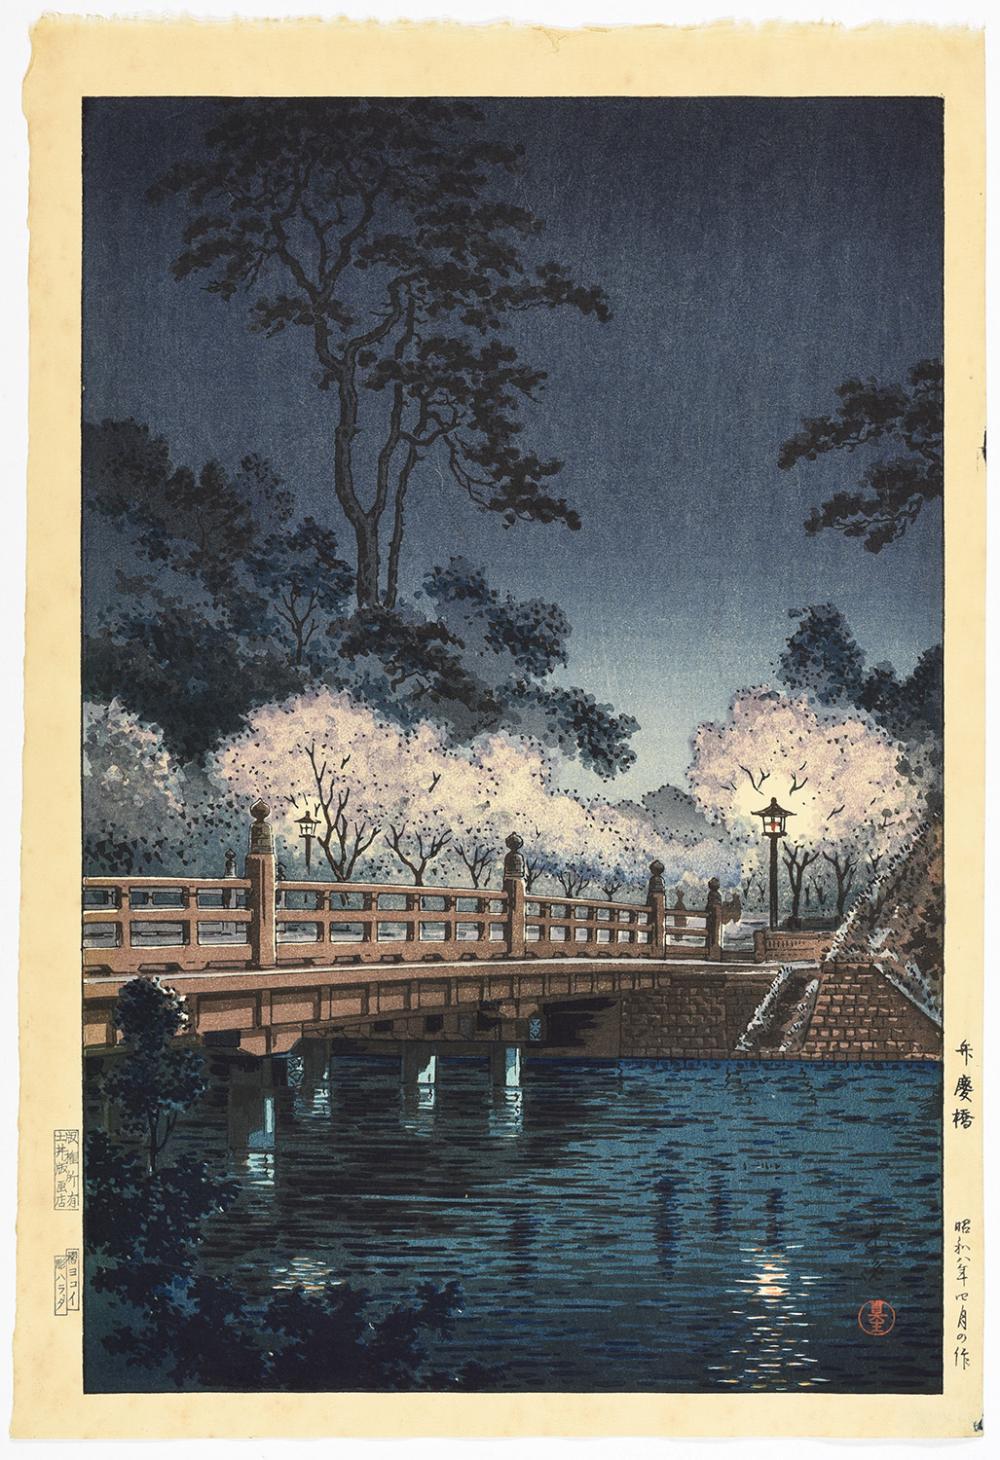 Koitsu Tsuchiya (Japanese, 1870 - 1949), Benkei Bridge, woodblock print on paper,